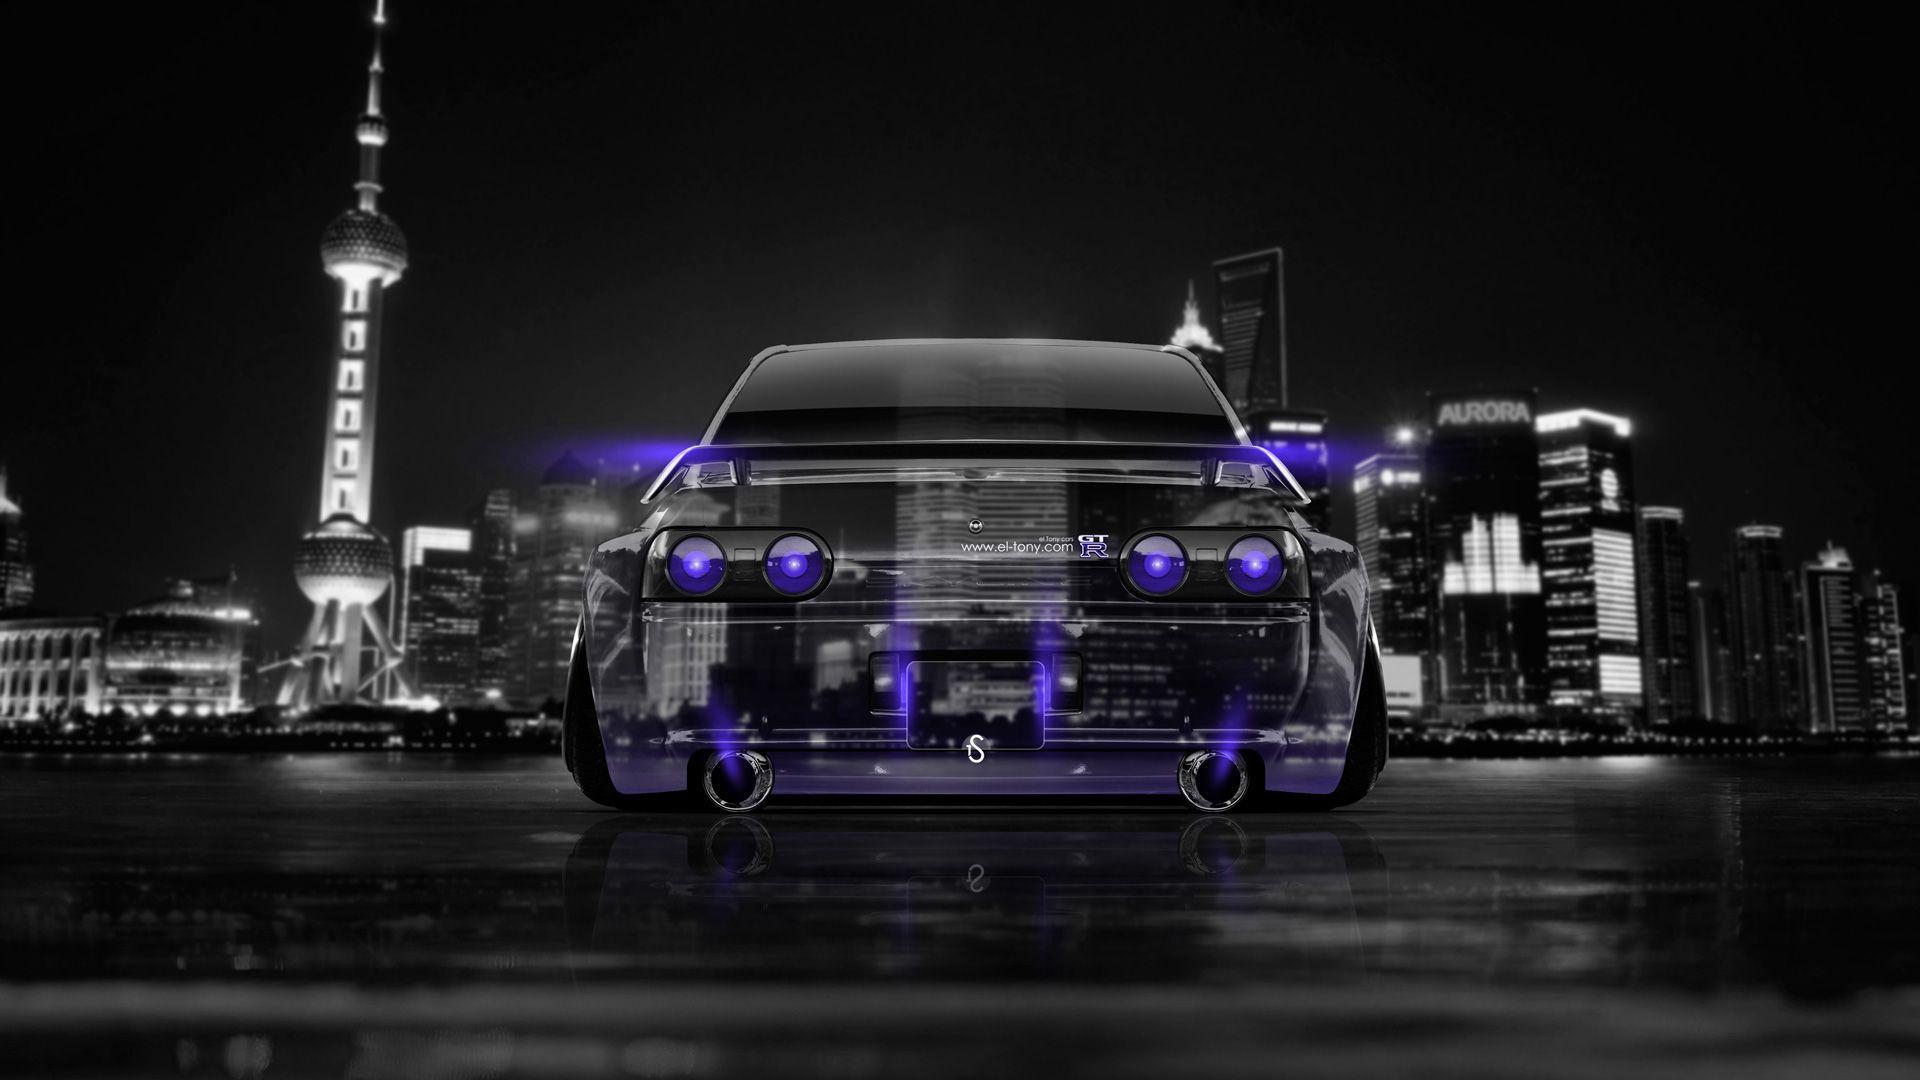 Nissan Skyline GTR R32 JDM Back Crystal City Car 2014 | El Tony